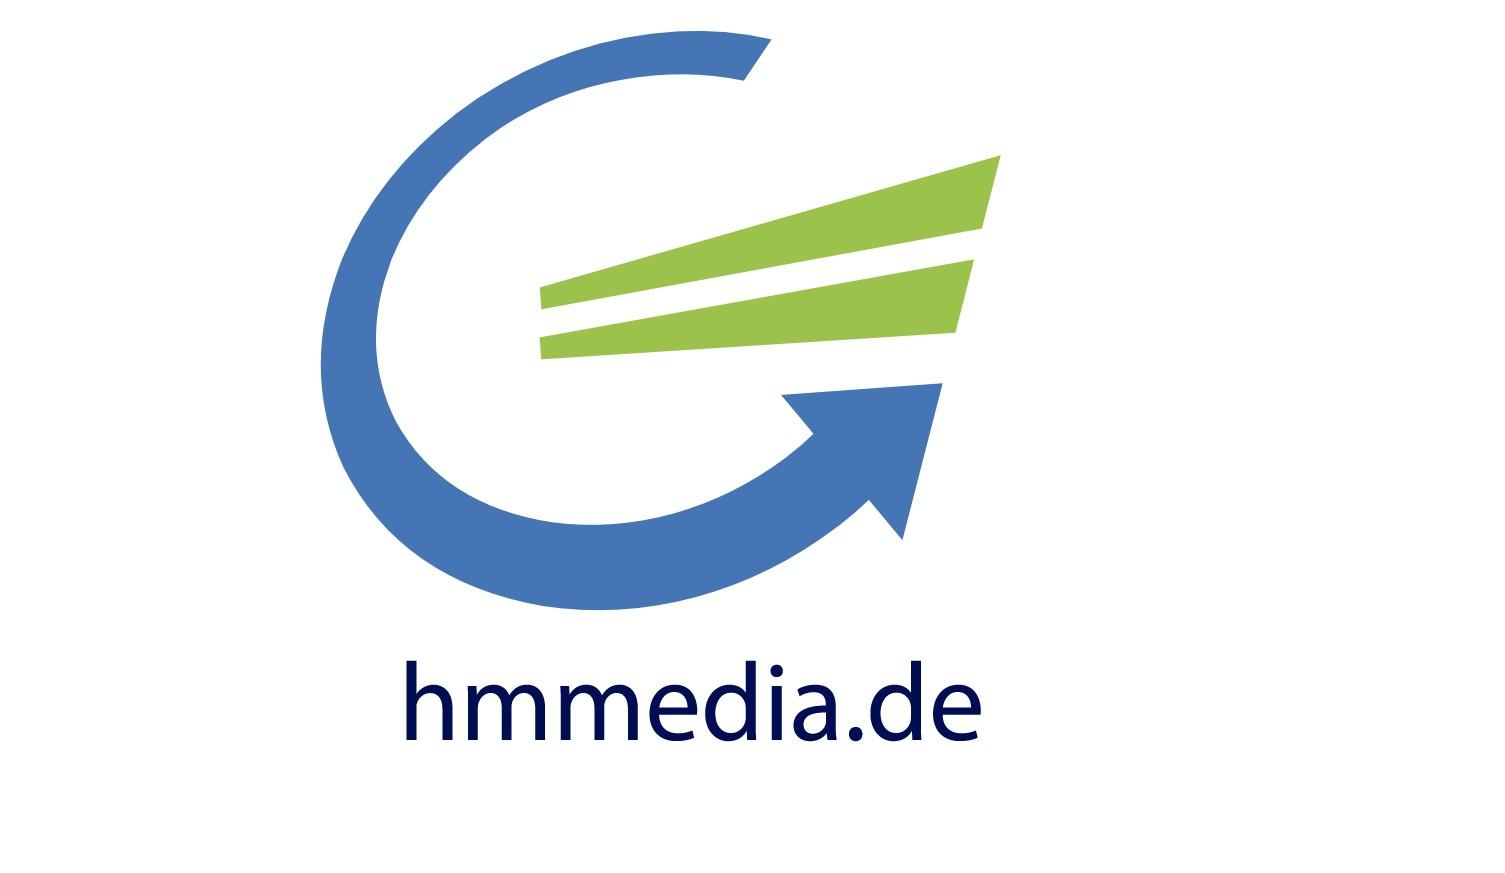 hmmedia_logo